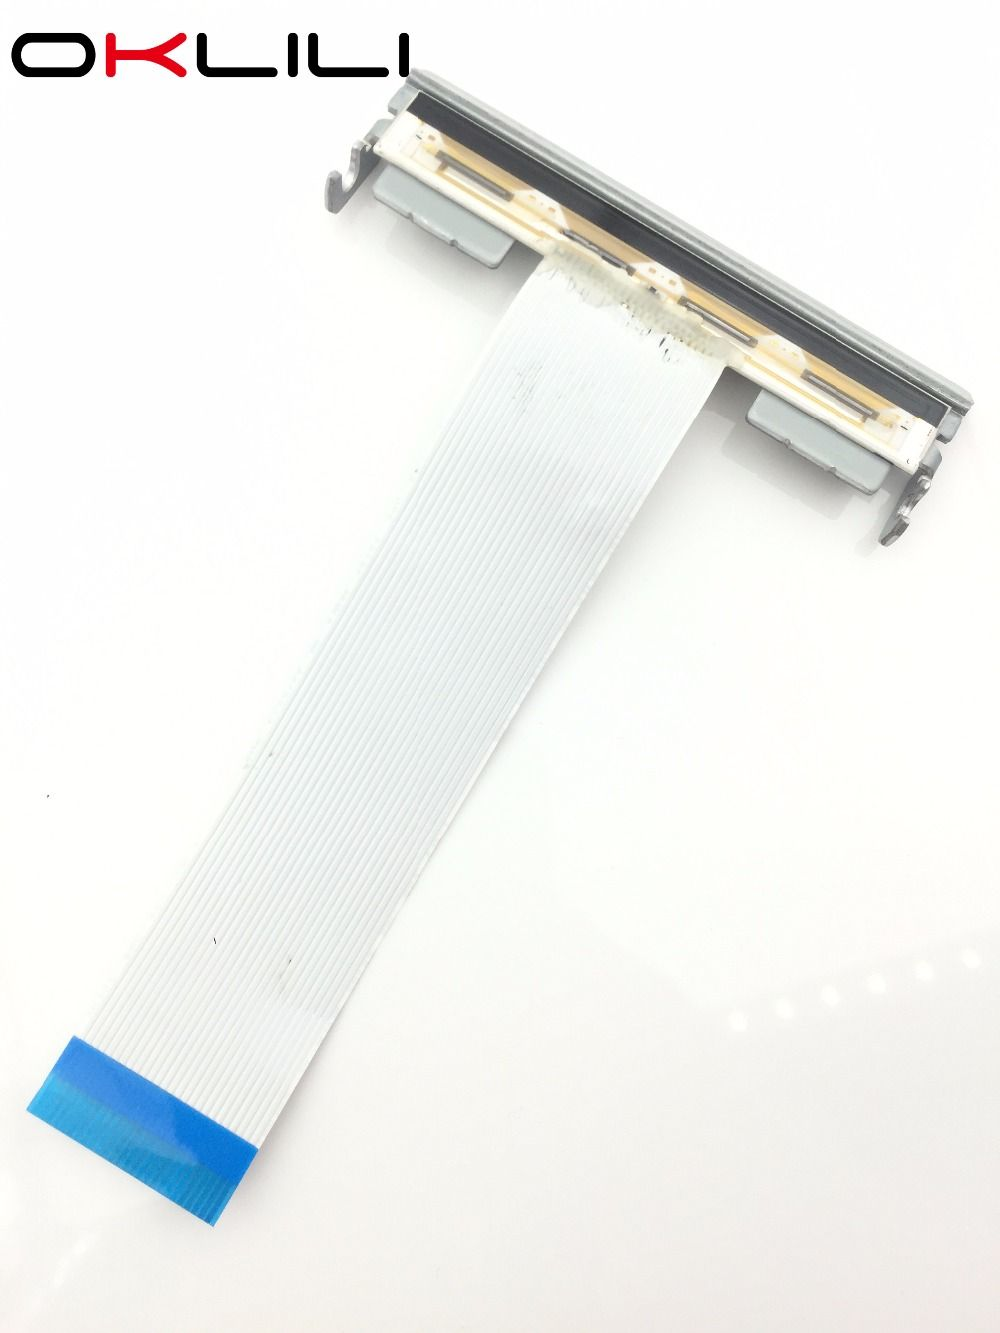 New Thermal Printhead for Epson TM-T88V Receipt Printers 2141001 2131885 2138822